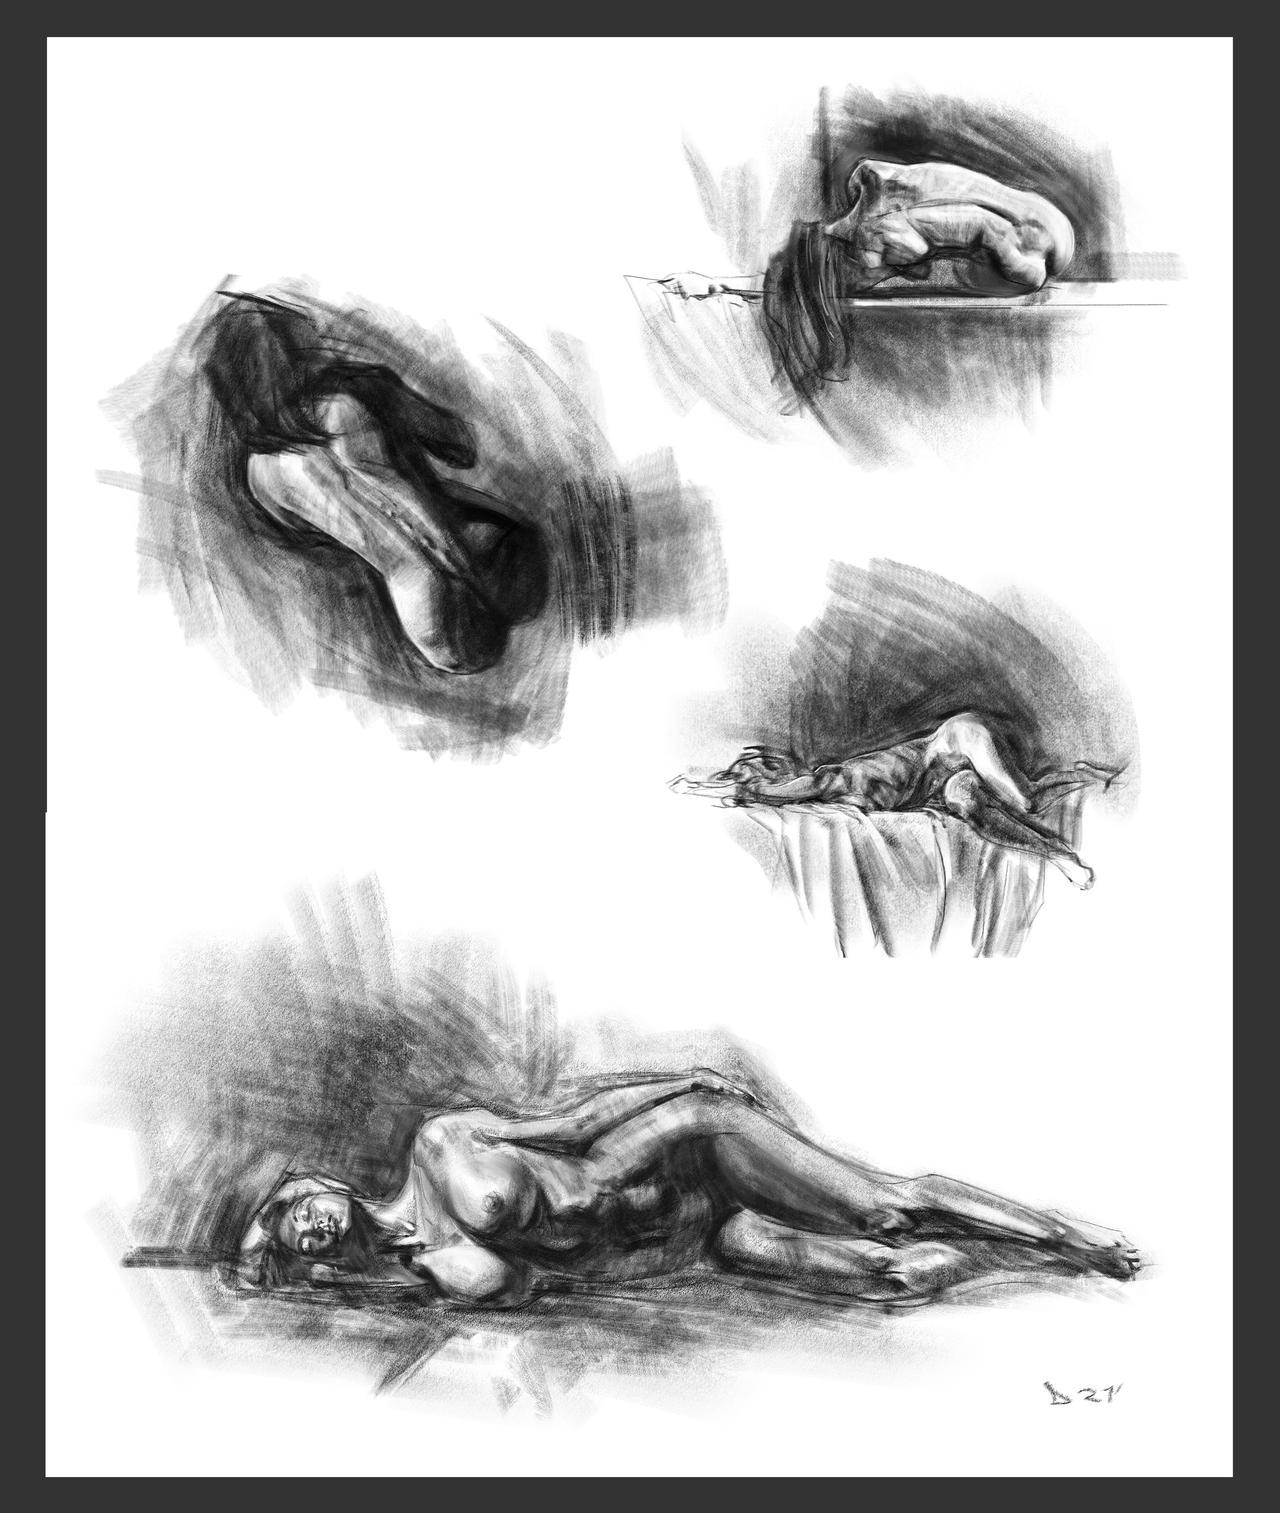 Charcoal studies pt 2